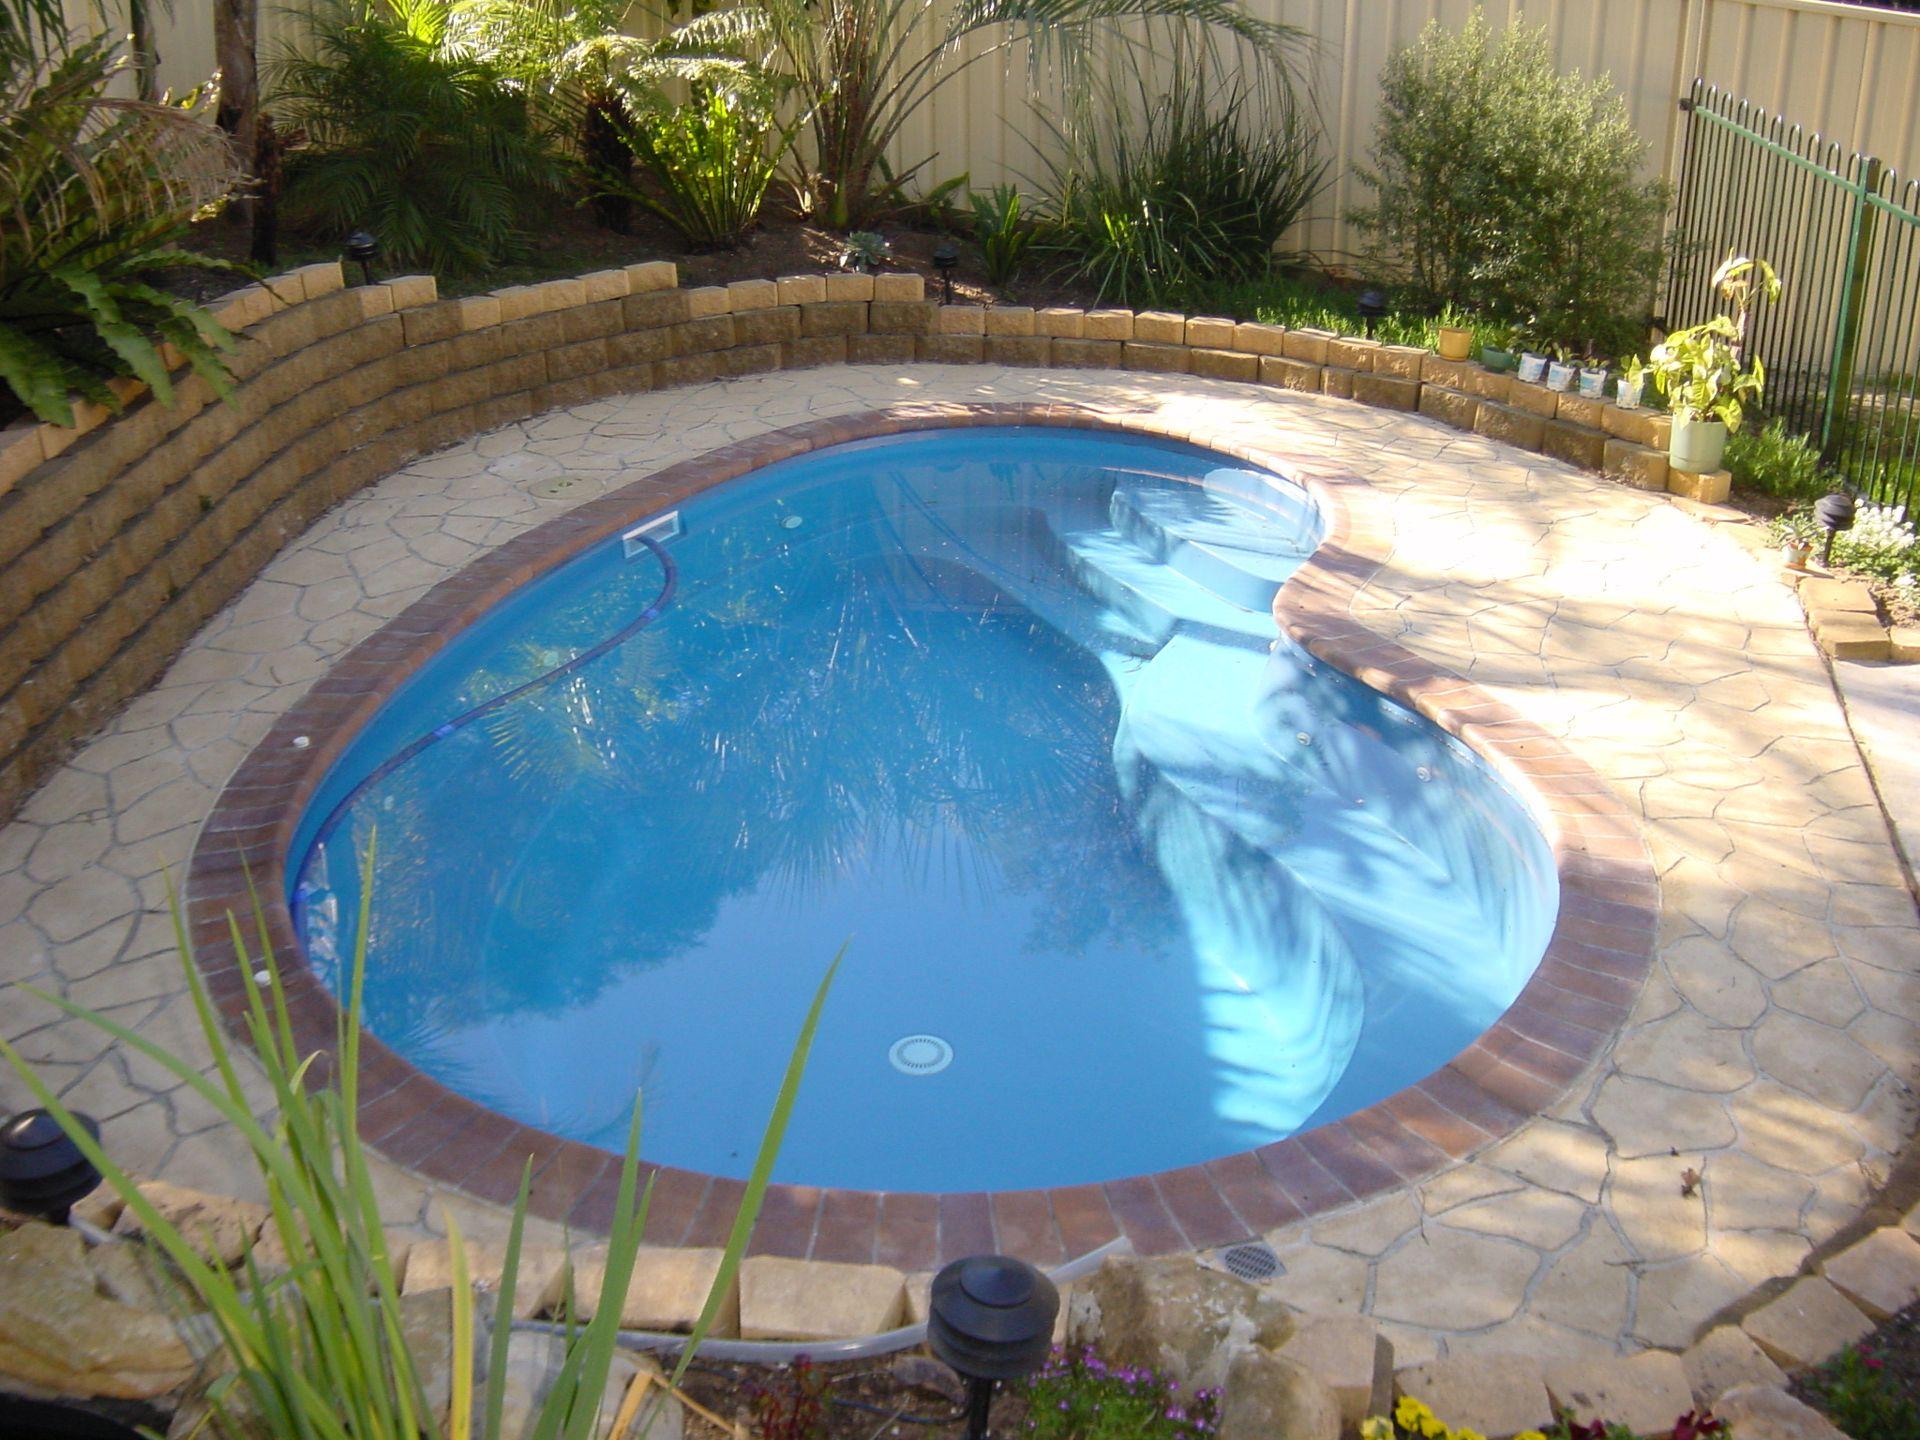 Narellan Pools Macarthur Plunge Pool Swimming Pools Fibreglass Pools Inground Pools Small Inground Pool Small Backyard Pools Swimming Pools Backyard